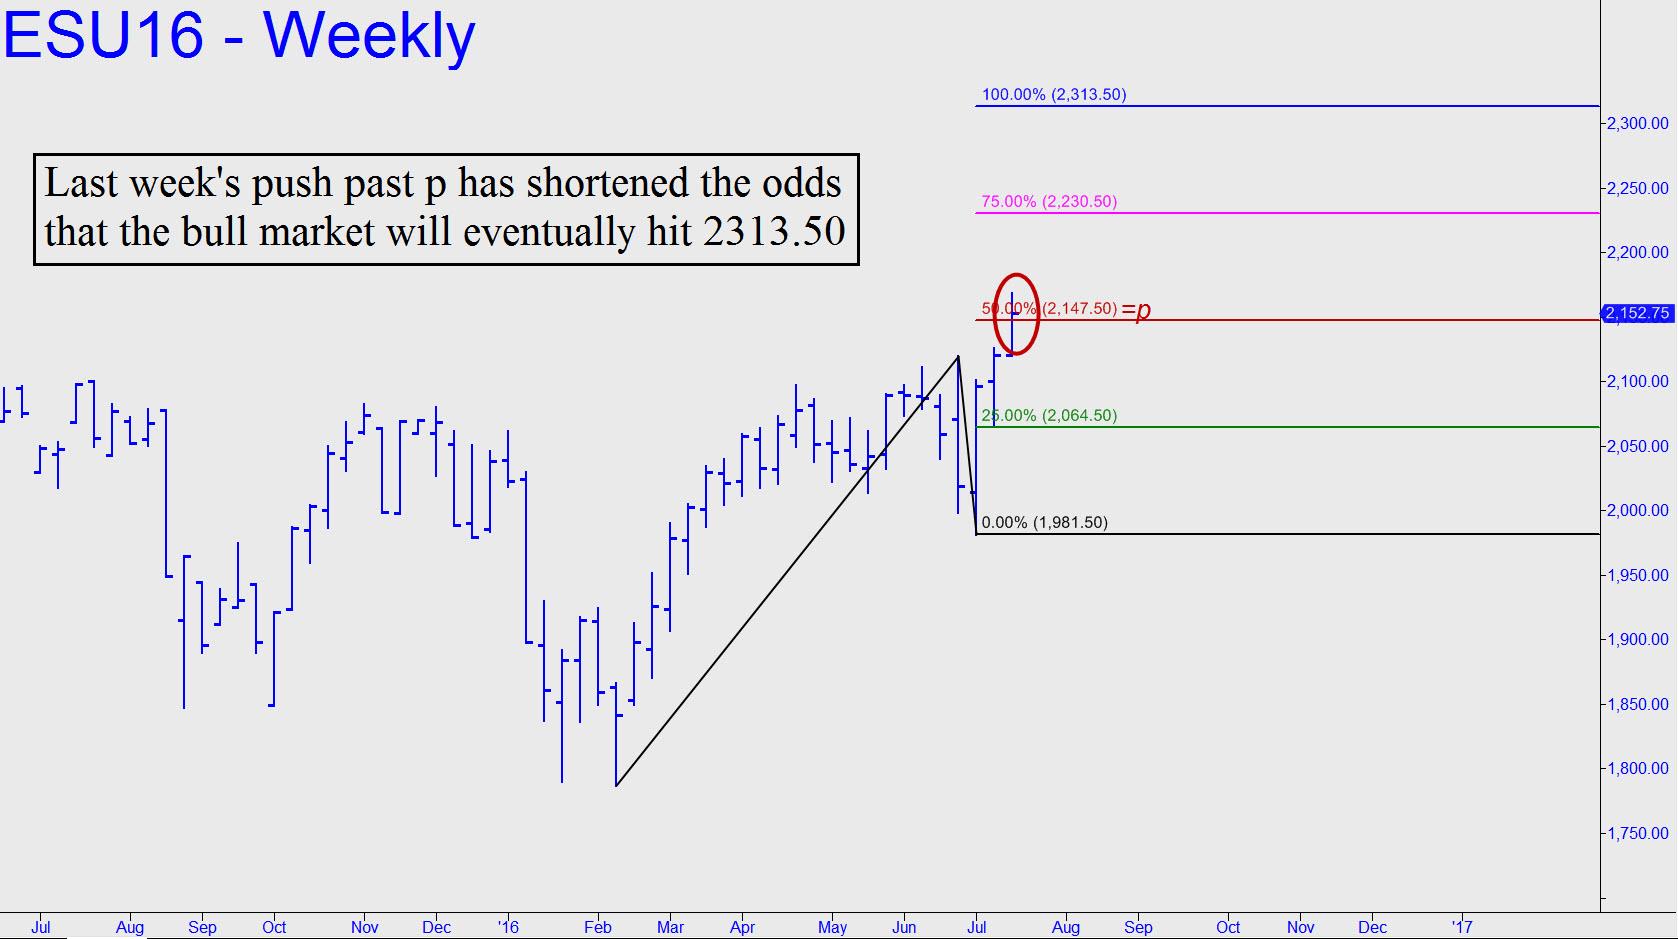 http://www.rickackerman.com/wp-content/uploads/2016/07/ES-push-past-p-has-shortened-odds.jpg